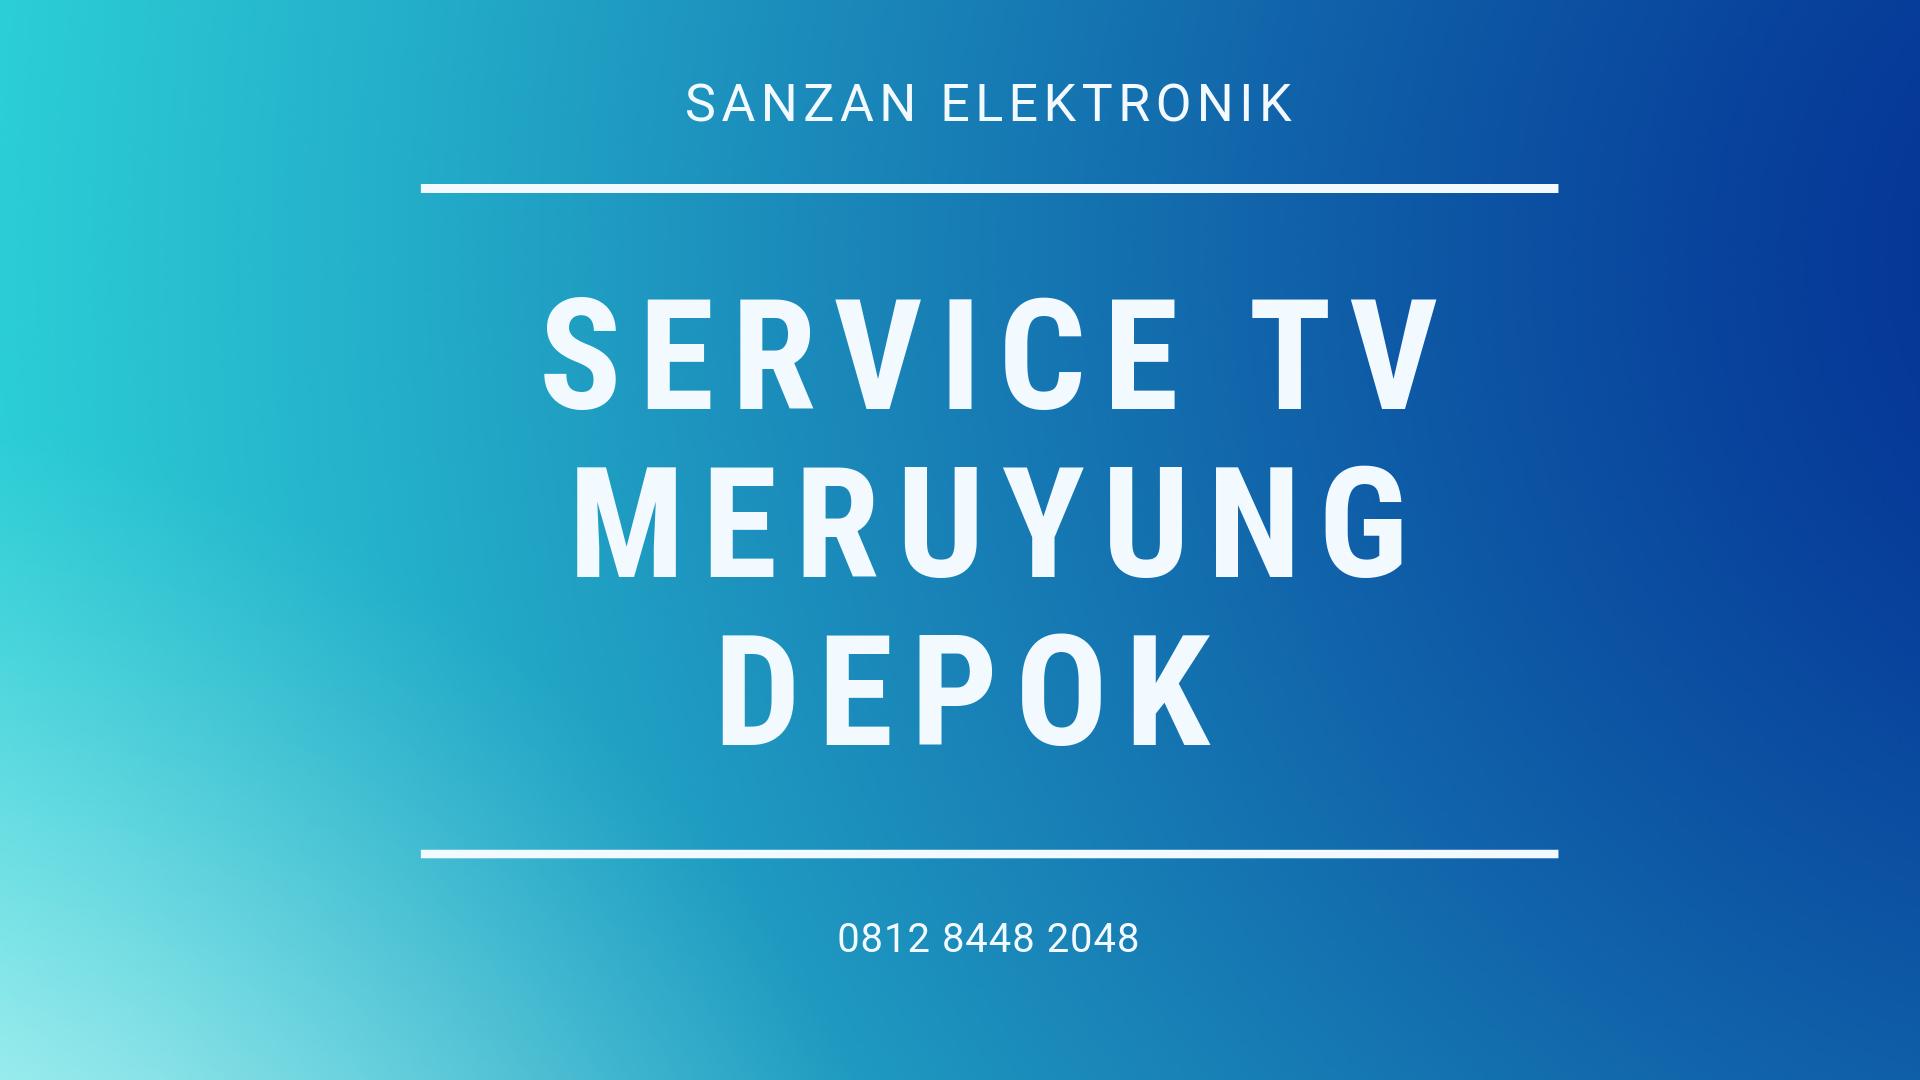 Service TV Meruyung Depok